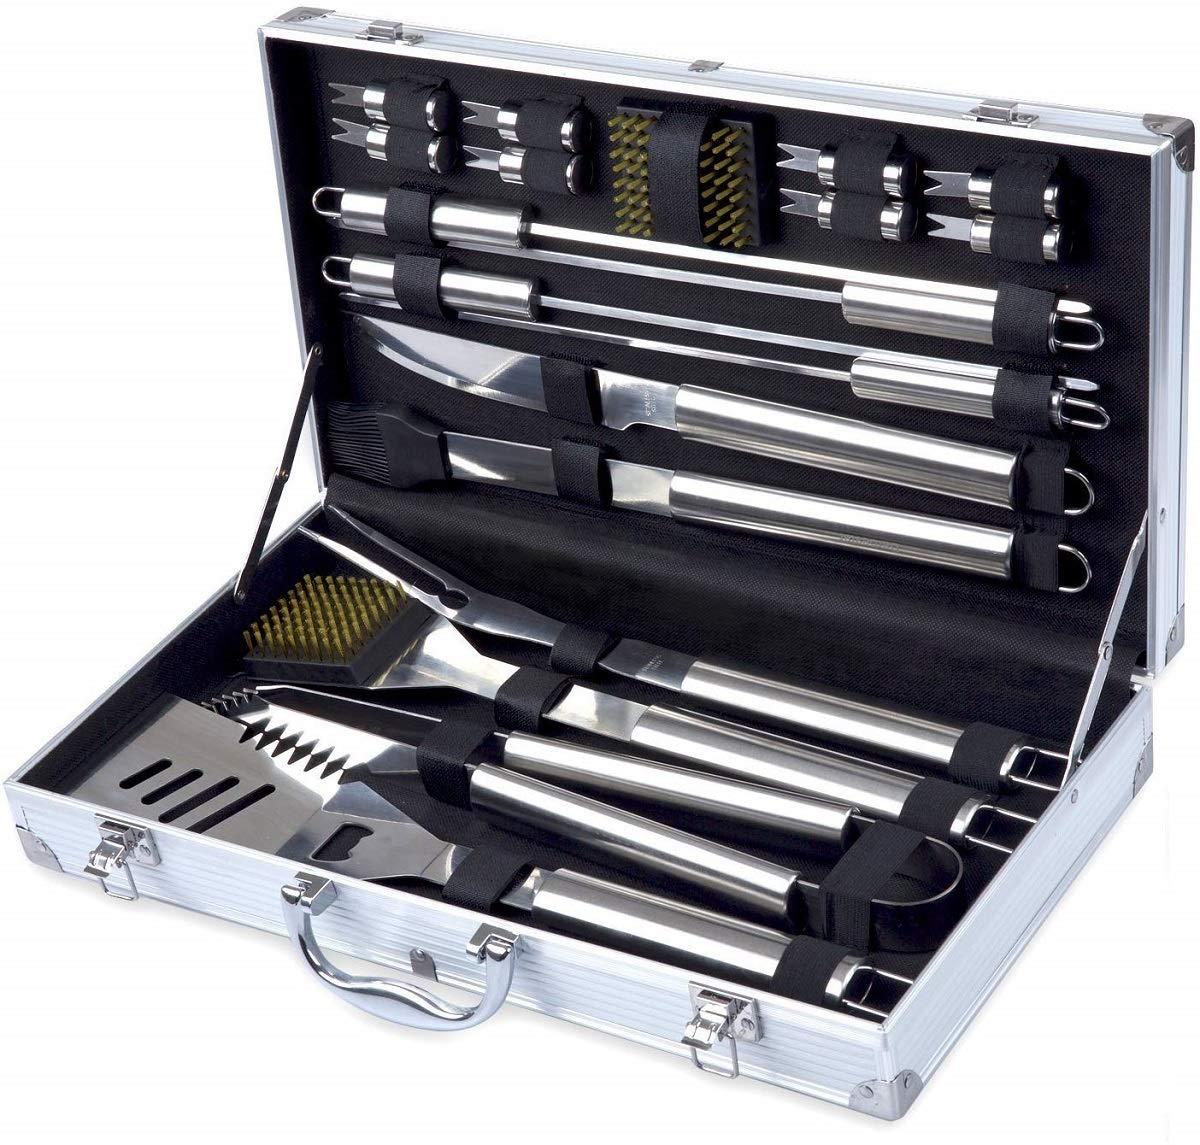 Kacebela Tools 19 Piece Grill Accessories